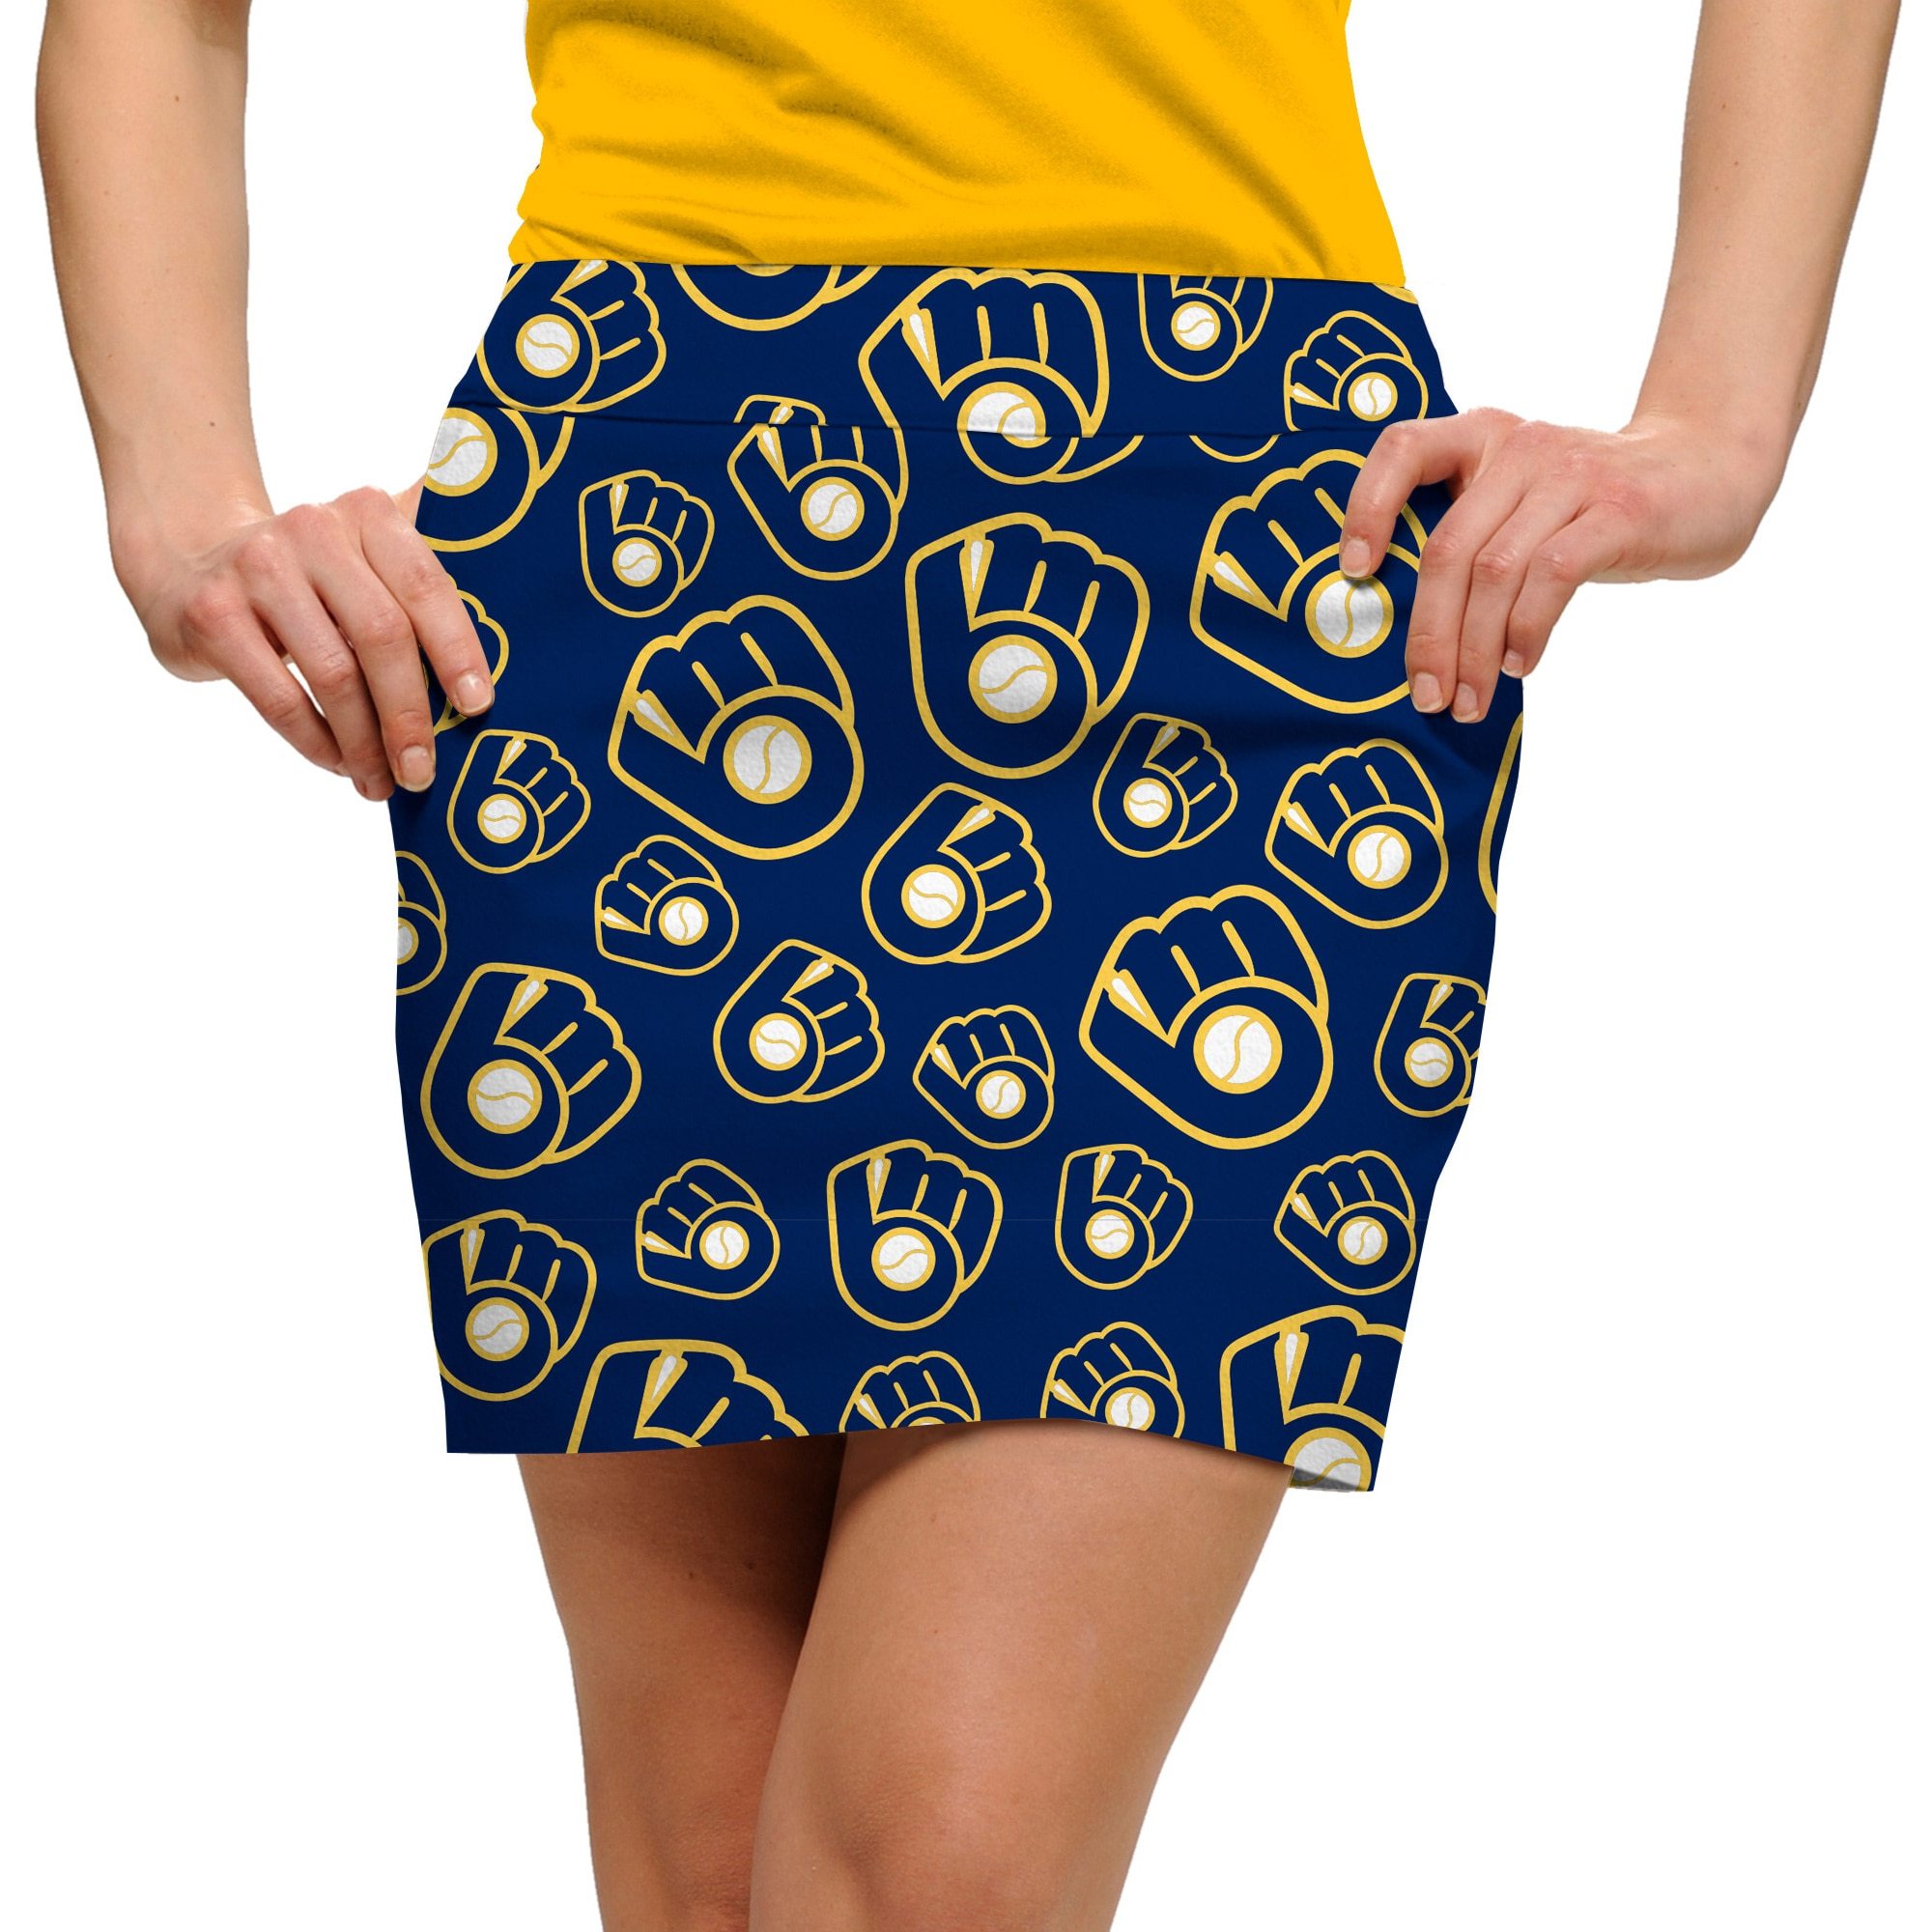 Milwaukee Brewers Loudmouth Women's Cooperstown Retro Skort - Navy/Gold